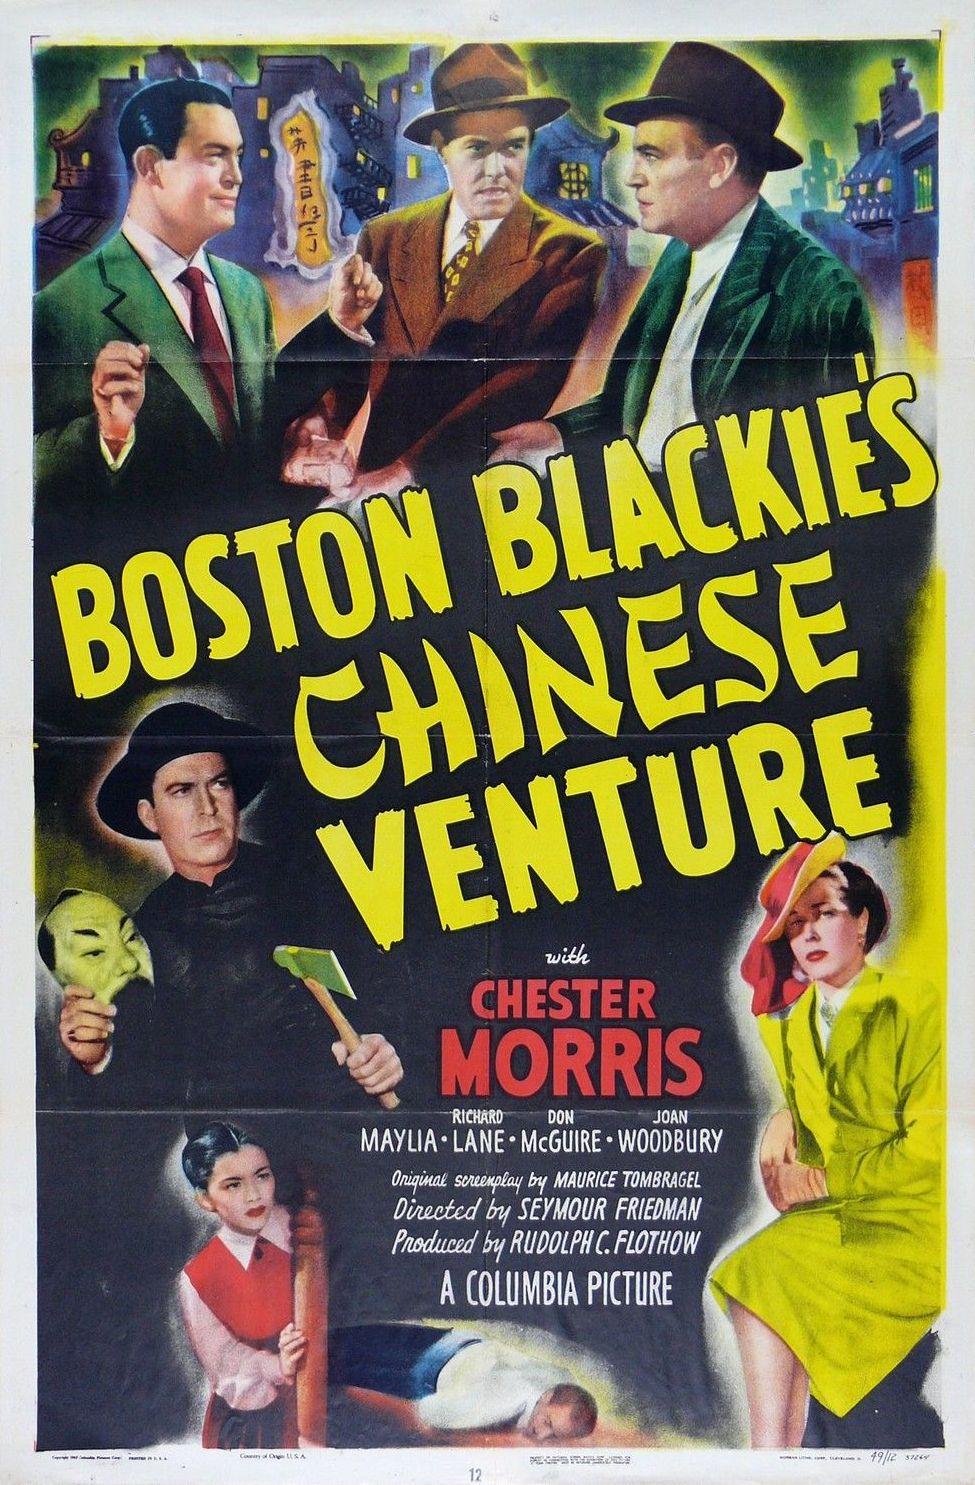 Richard Lane, Maylia, Don McGuire, Chester Morris, and Joan Woodbury in Boston Blackie's Chinese Venture (1949)